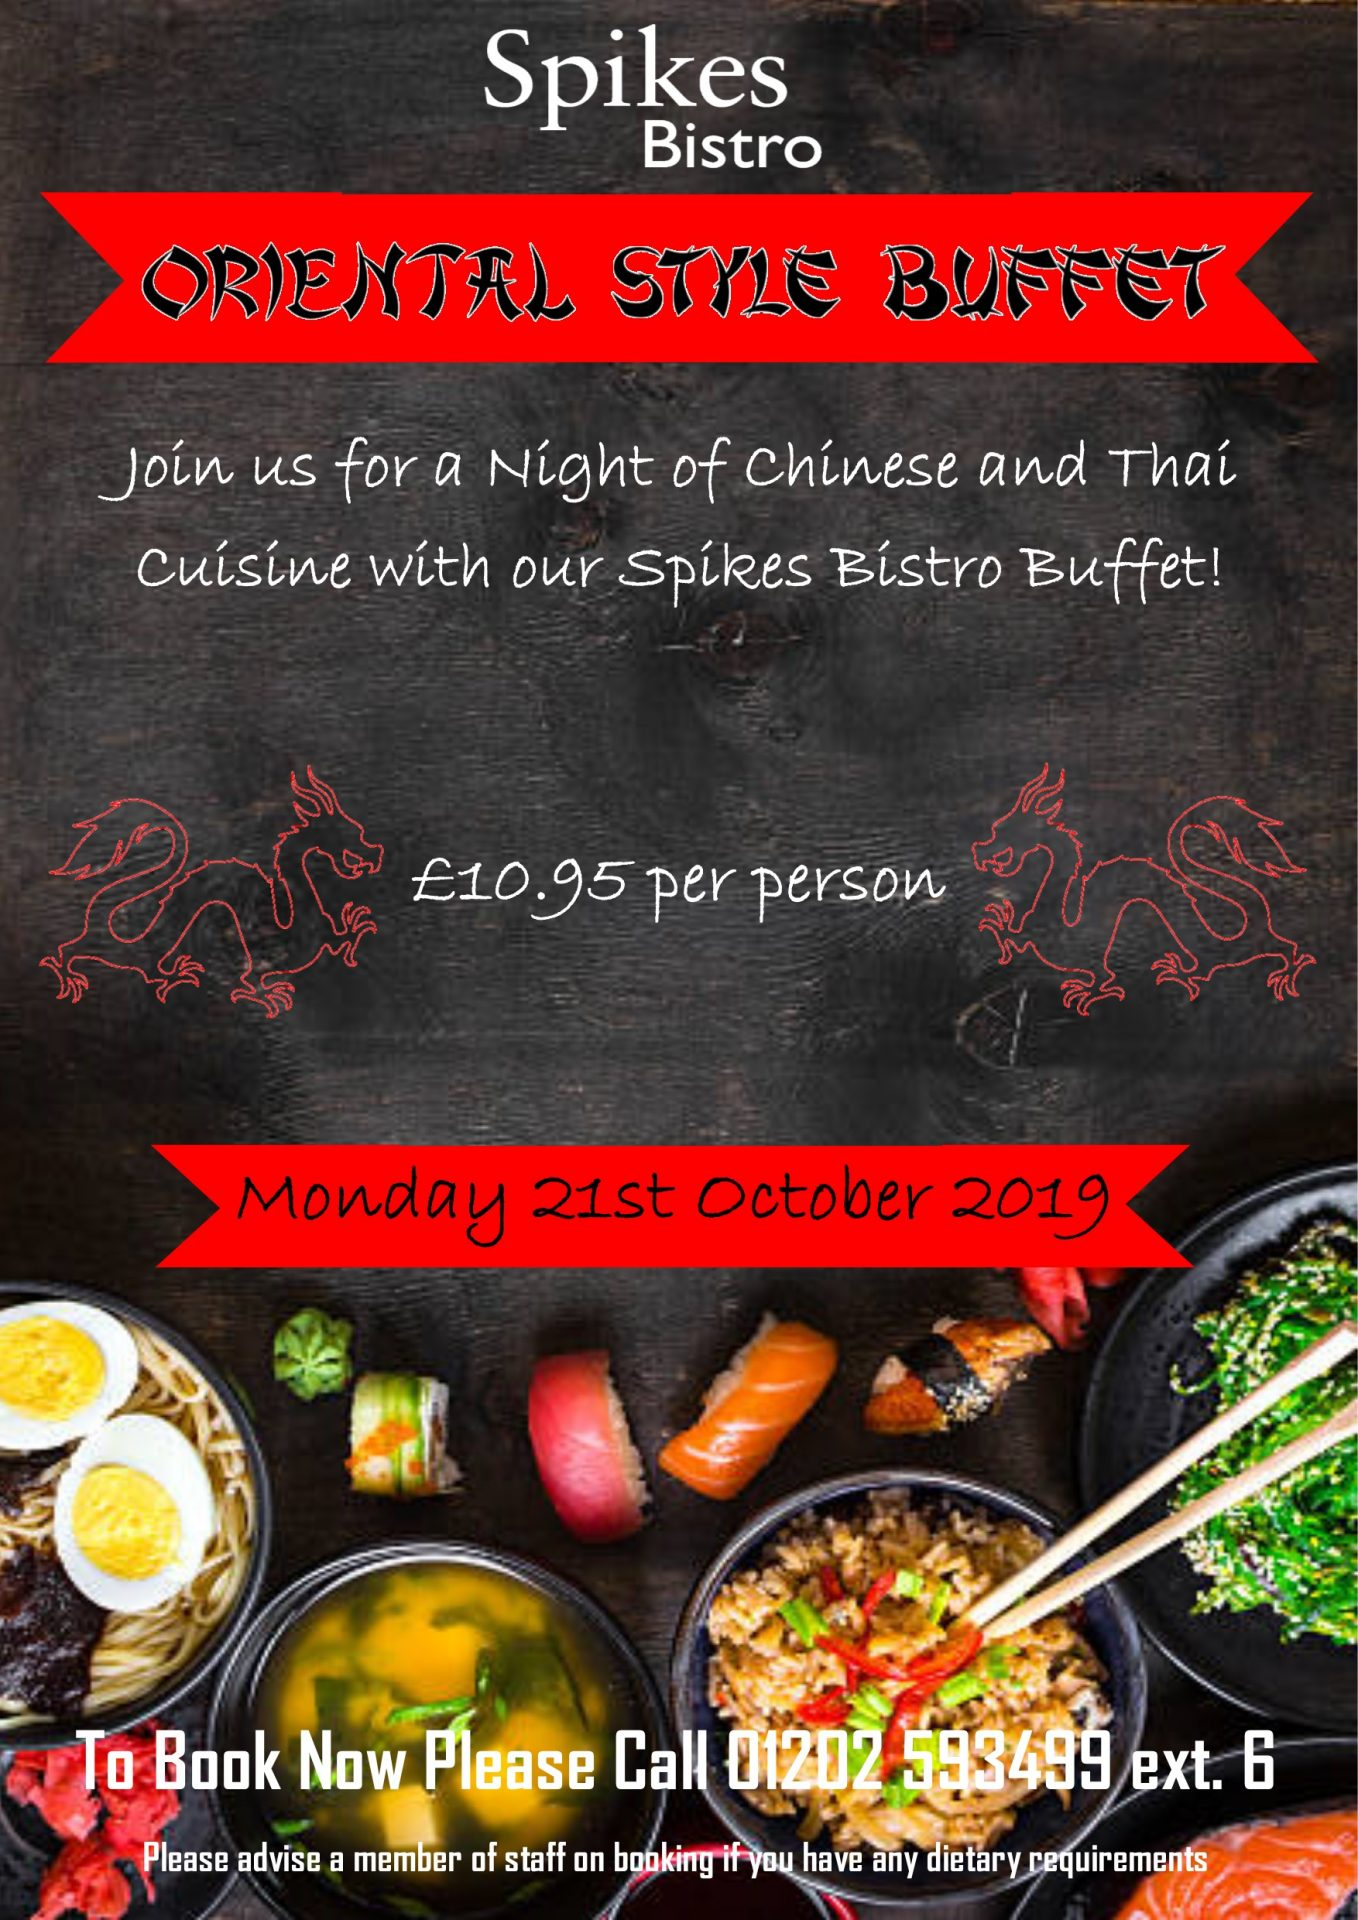 oriental style buffet in spikes bistro   dudsbury golf club